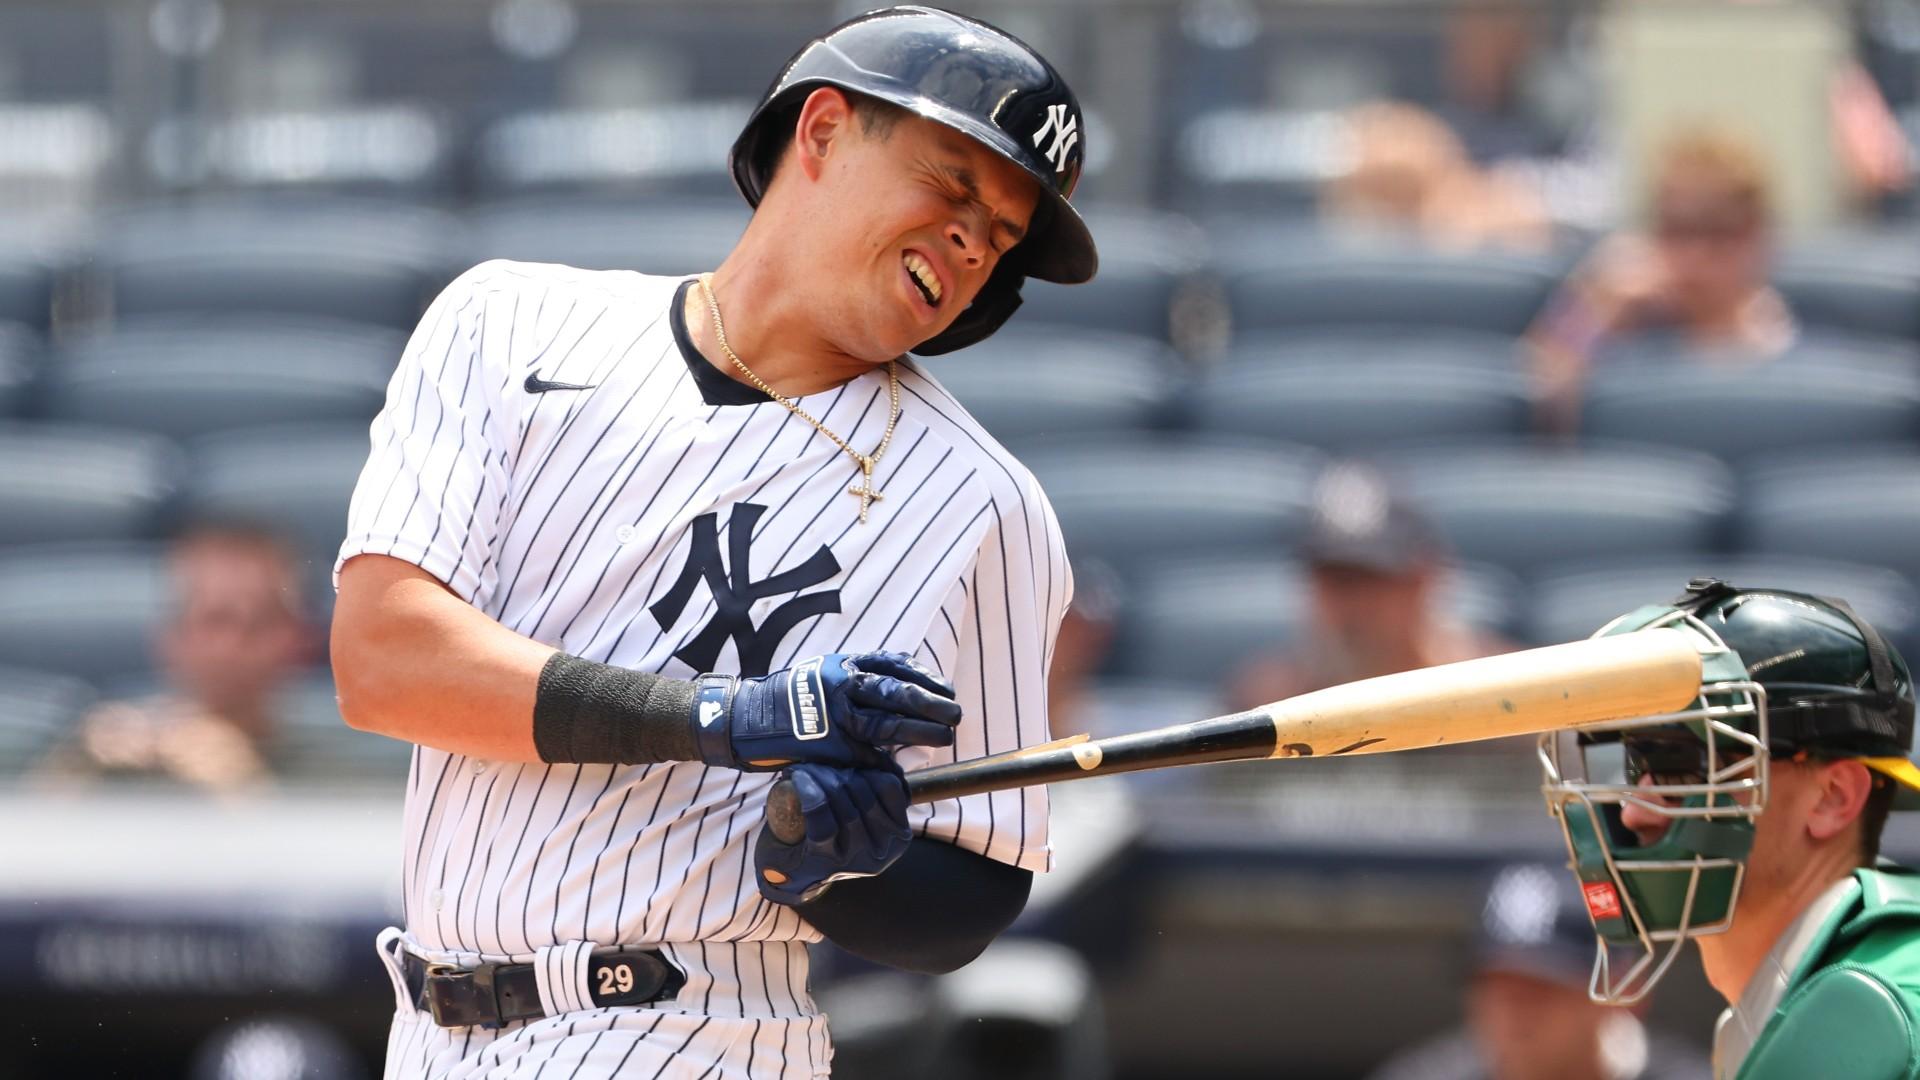 Yankees' Gio Urshela recovers from bat splinter to eye and home run ahead in win